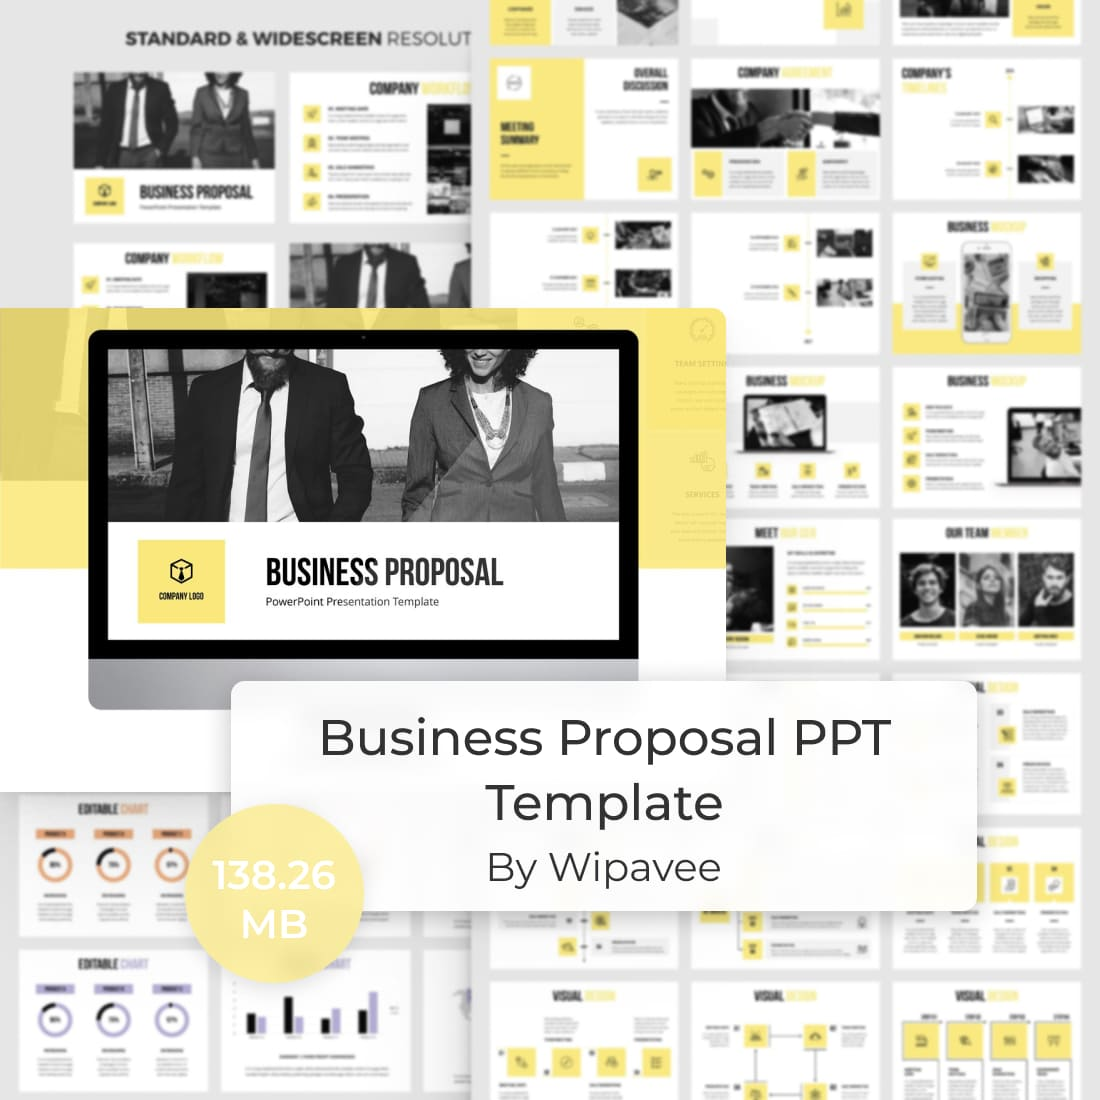 Business Proposal PPT Template by MasterBundles.